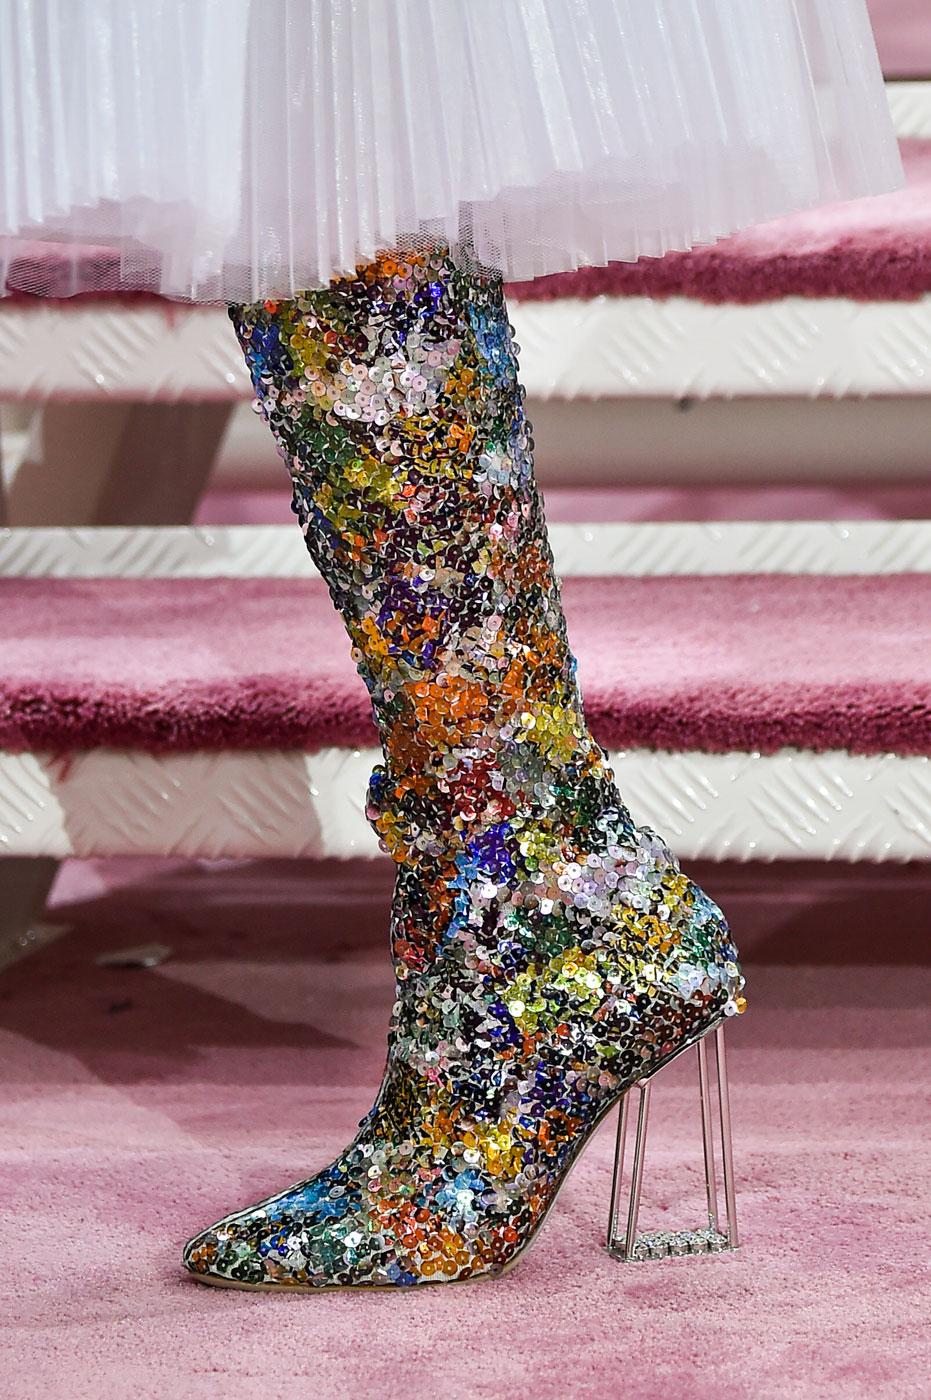 Christian-Dior-fashion-runway-show-close-ups-haute-couture-paris-spring-summer-2015-the-impression-127